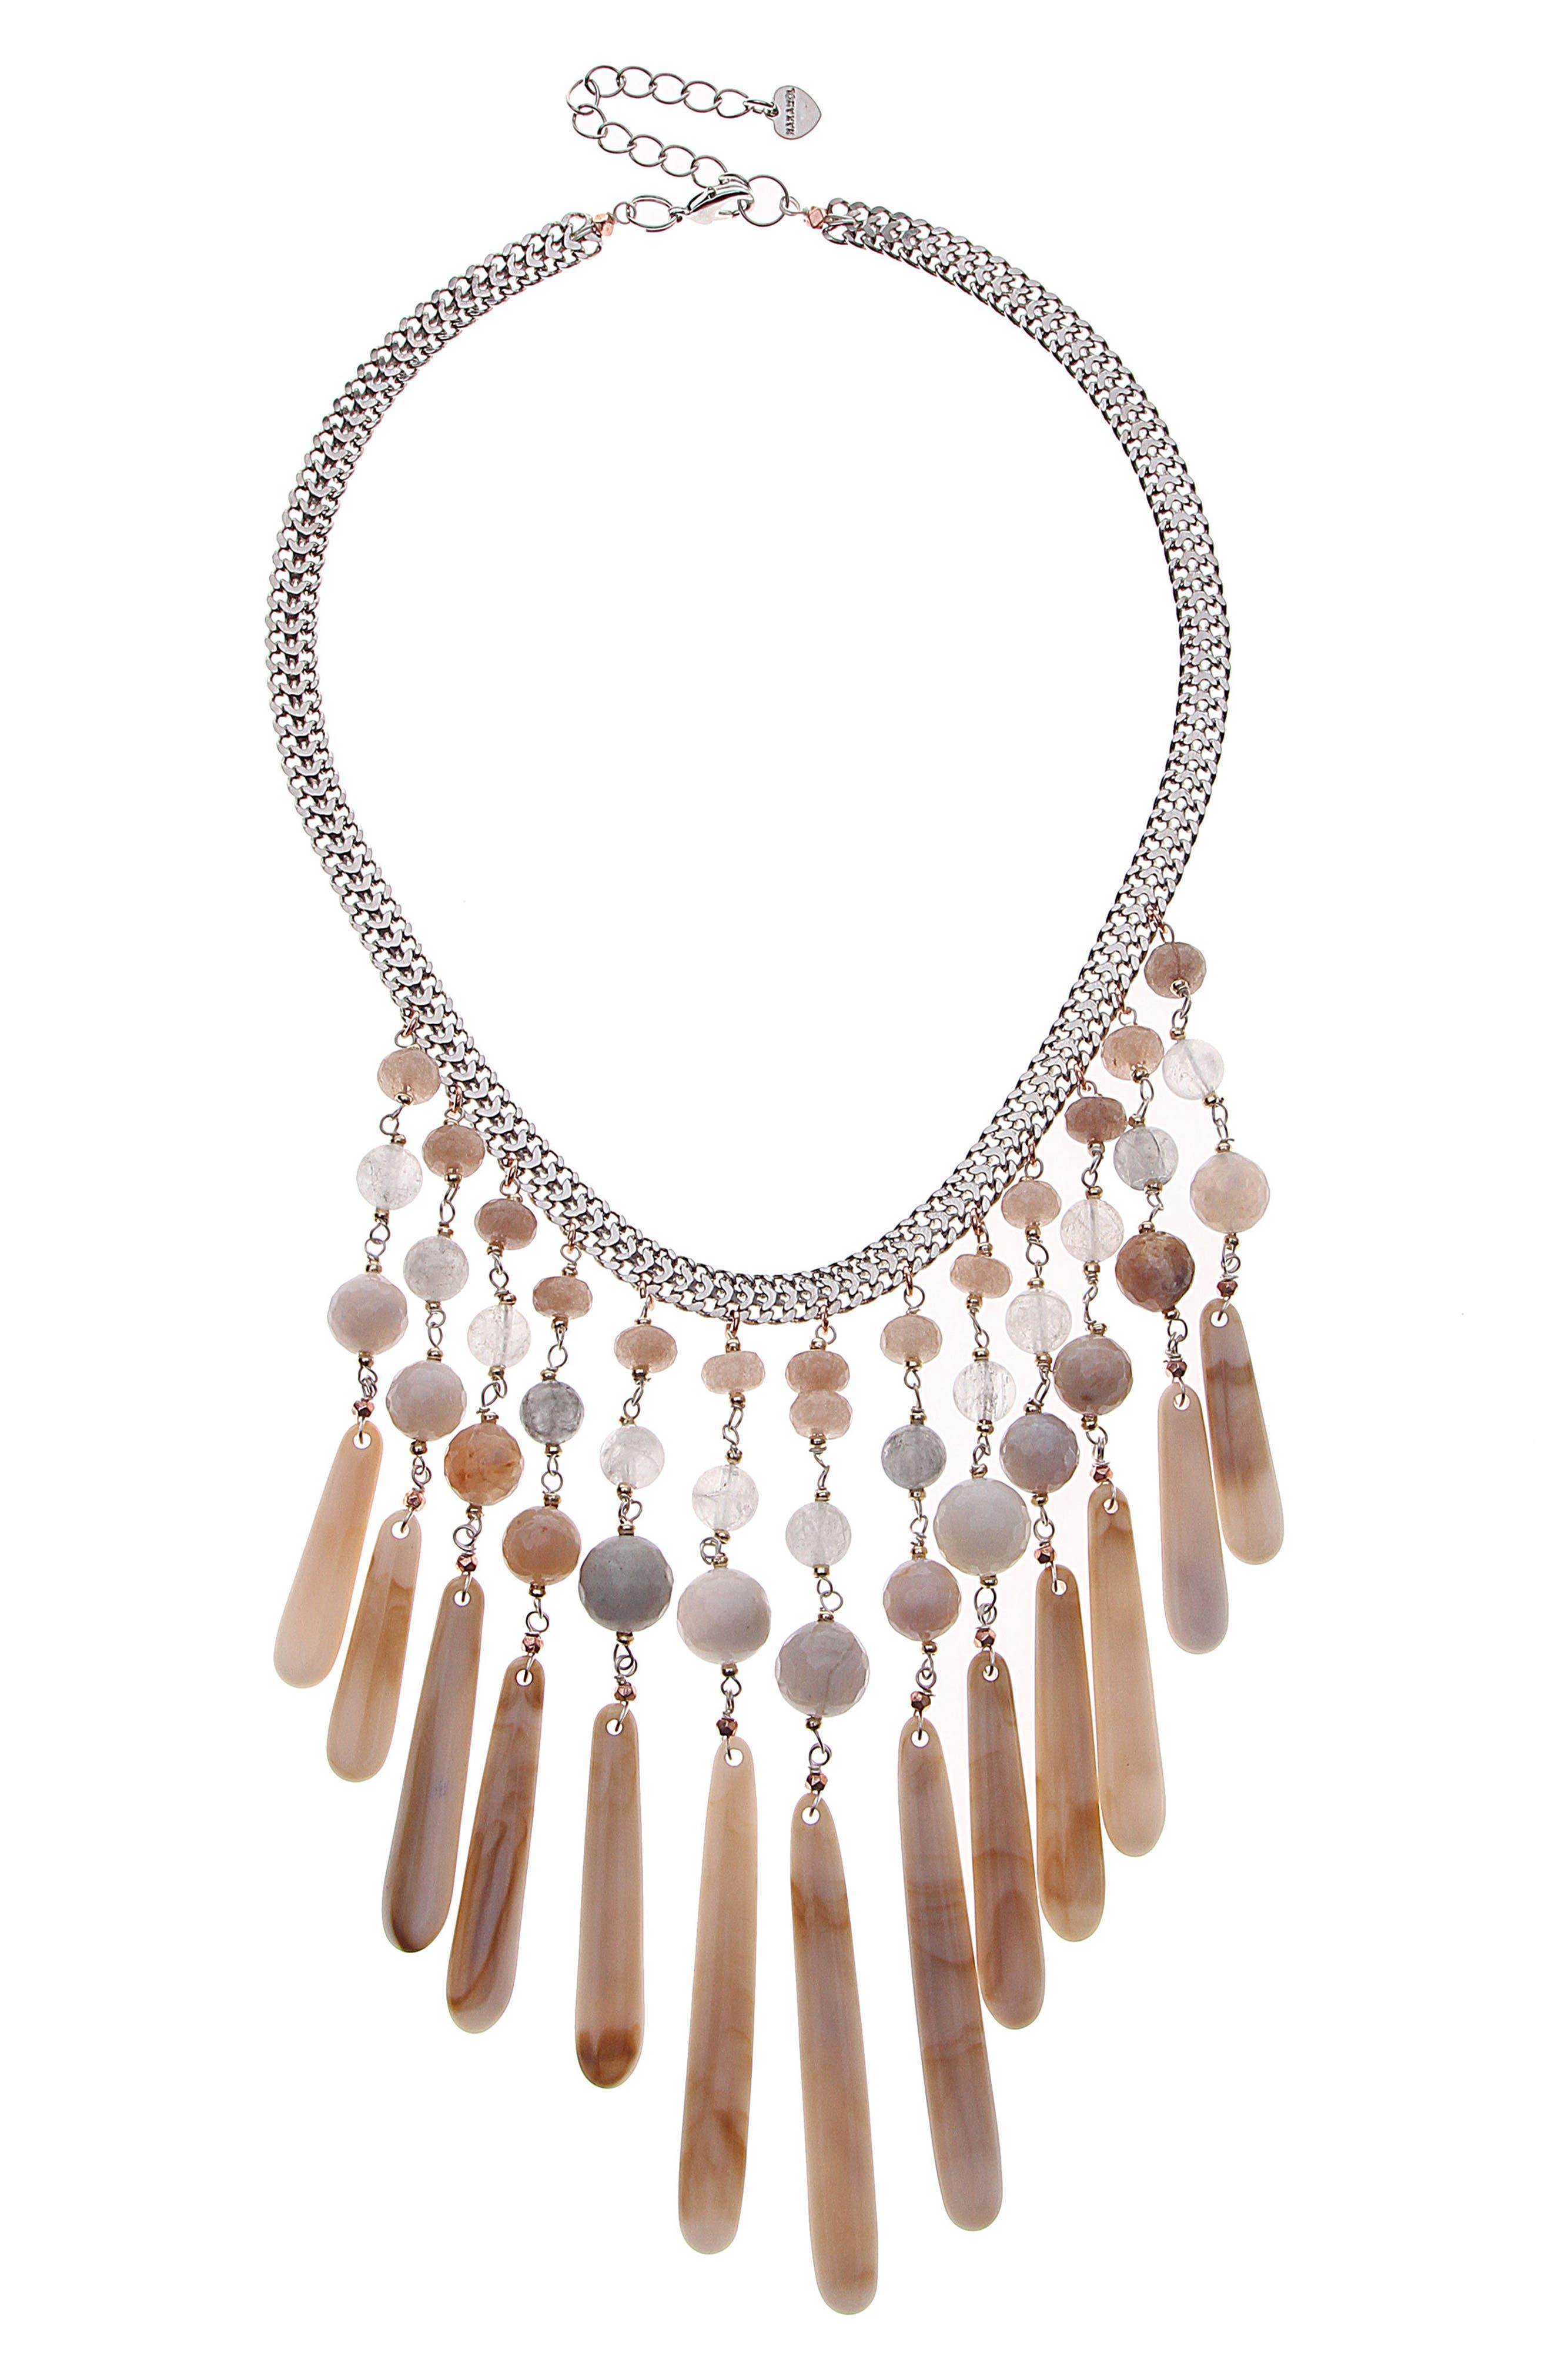 Semiprecious Stone Bib Necklace,                             Main thumbnail 1, color,                             900